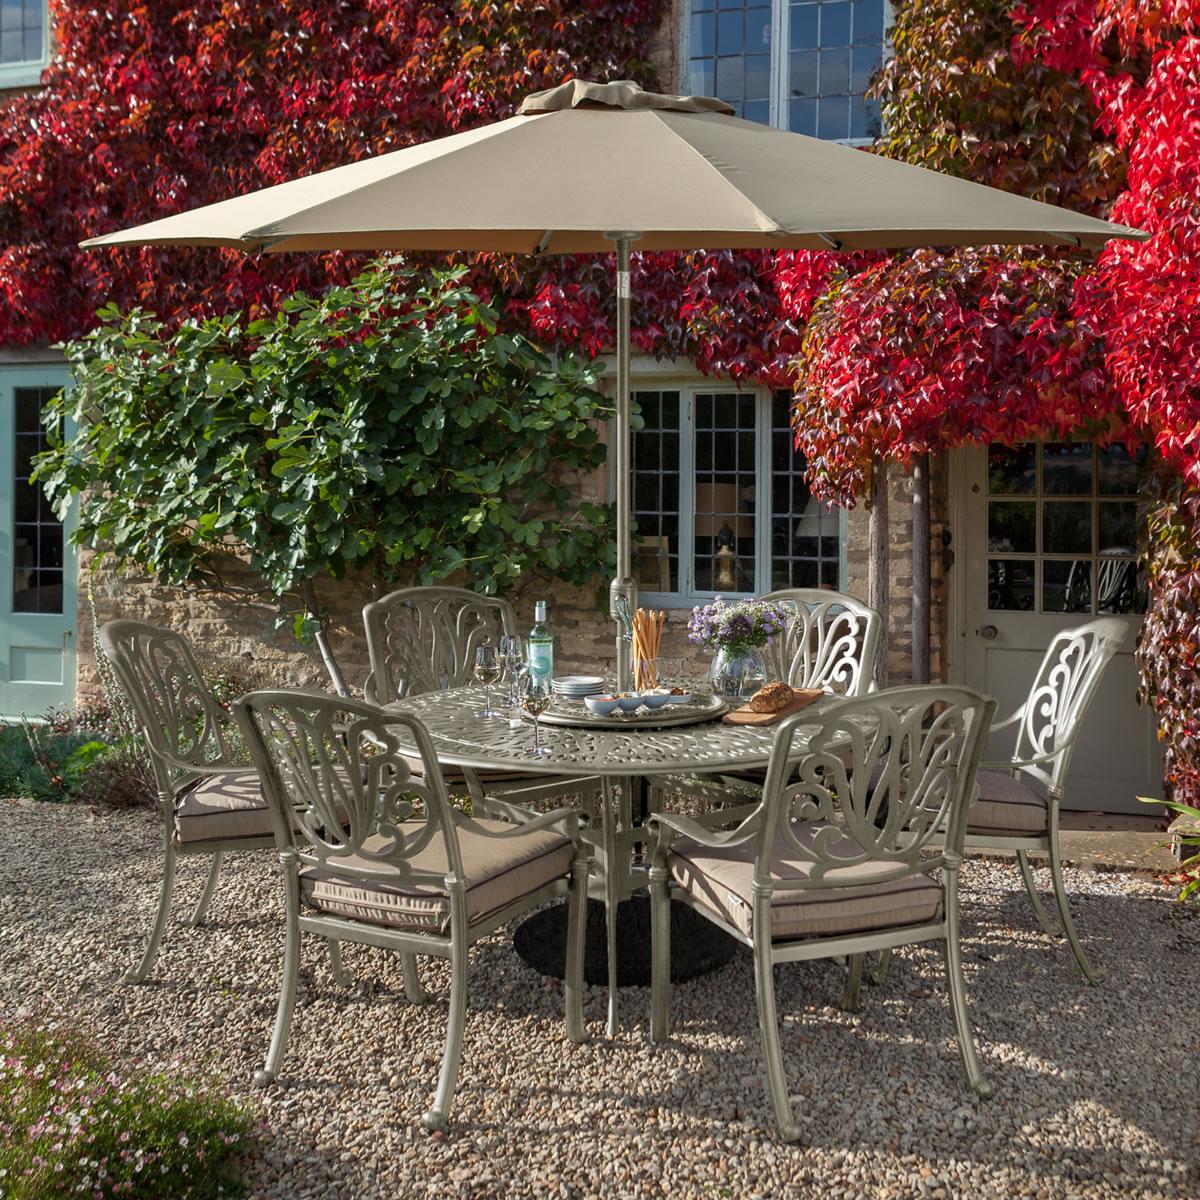 buy hartman amalfi seater oval set maize taupe 835 05 shop every rh pricepi com Who Makes Amalfi Furniture Amalfi Furniture Review